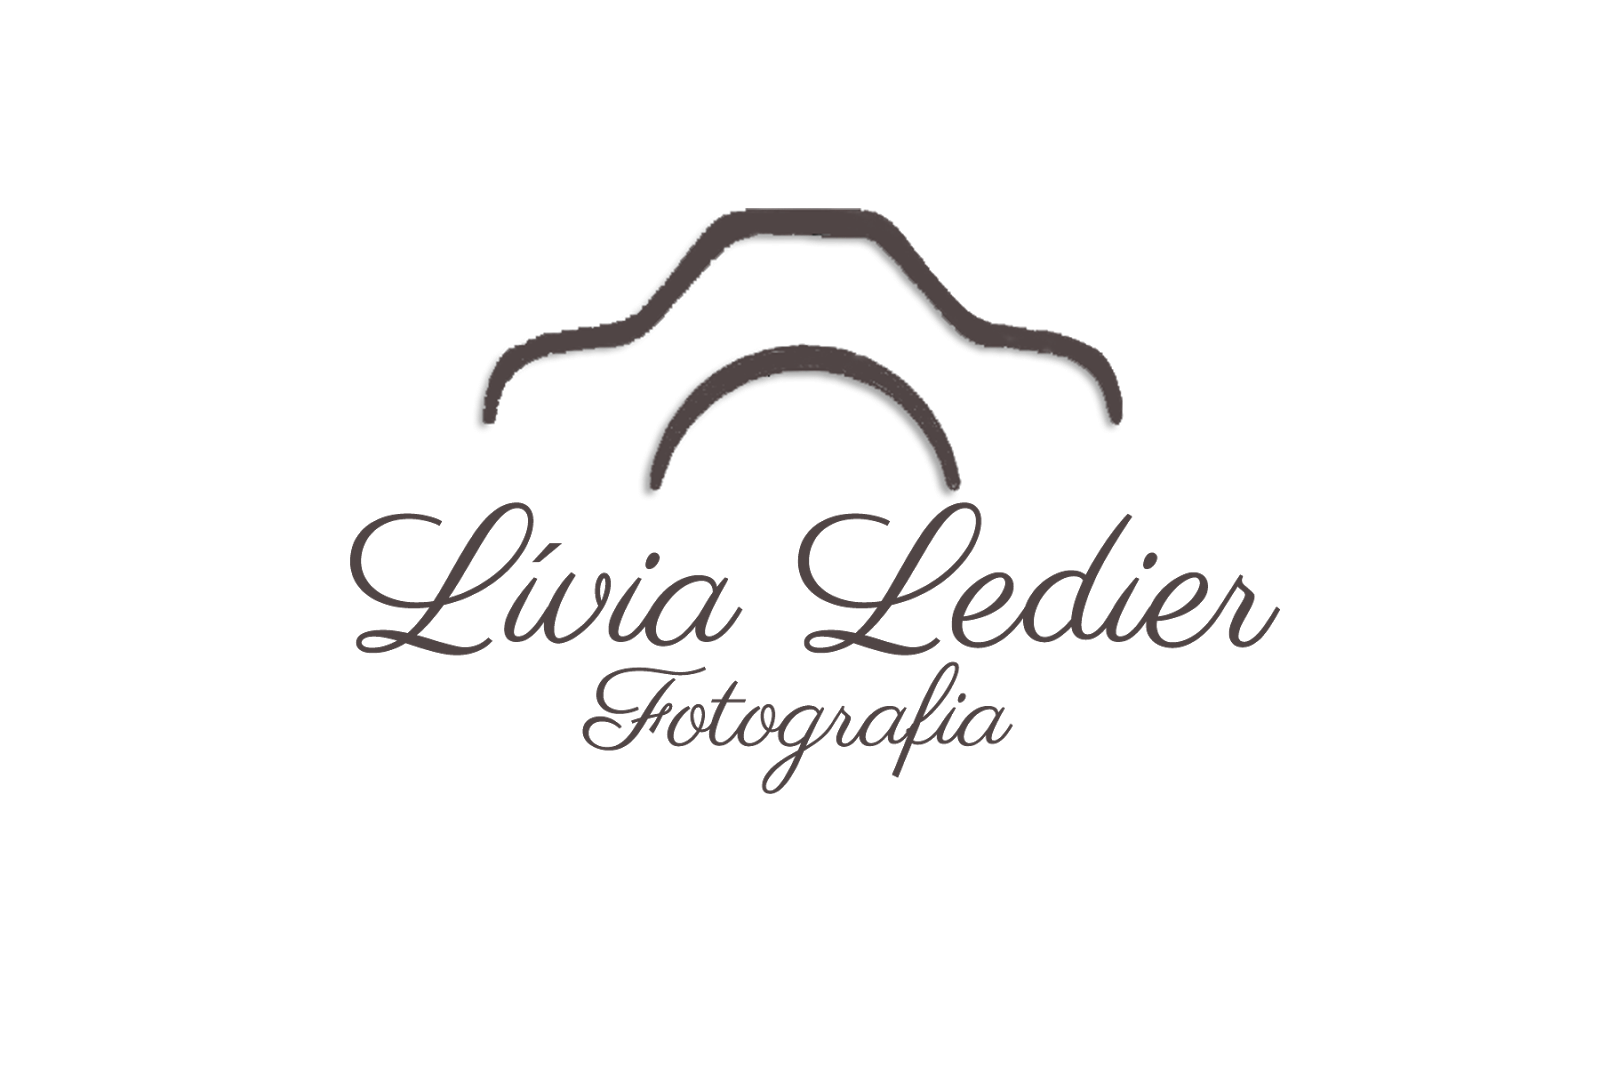 Lívia Ledier Fotografia